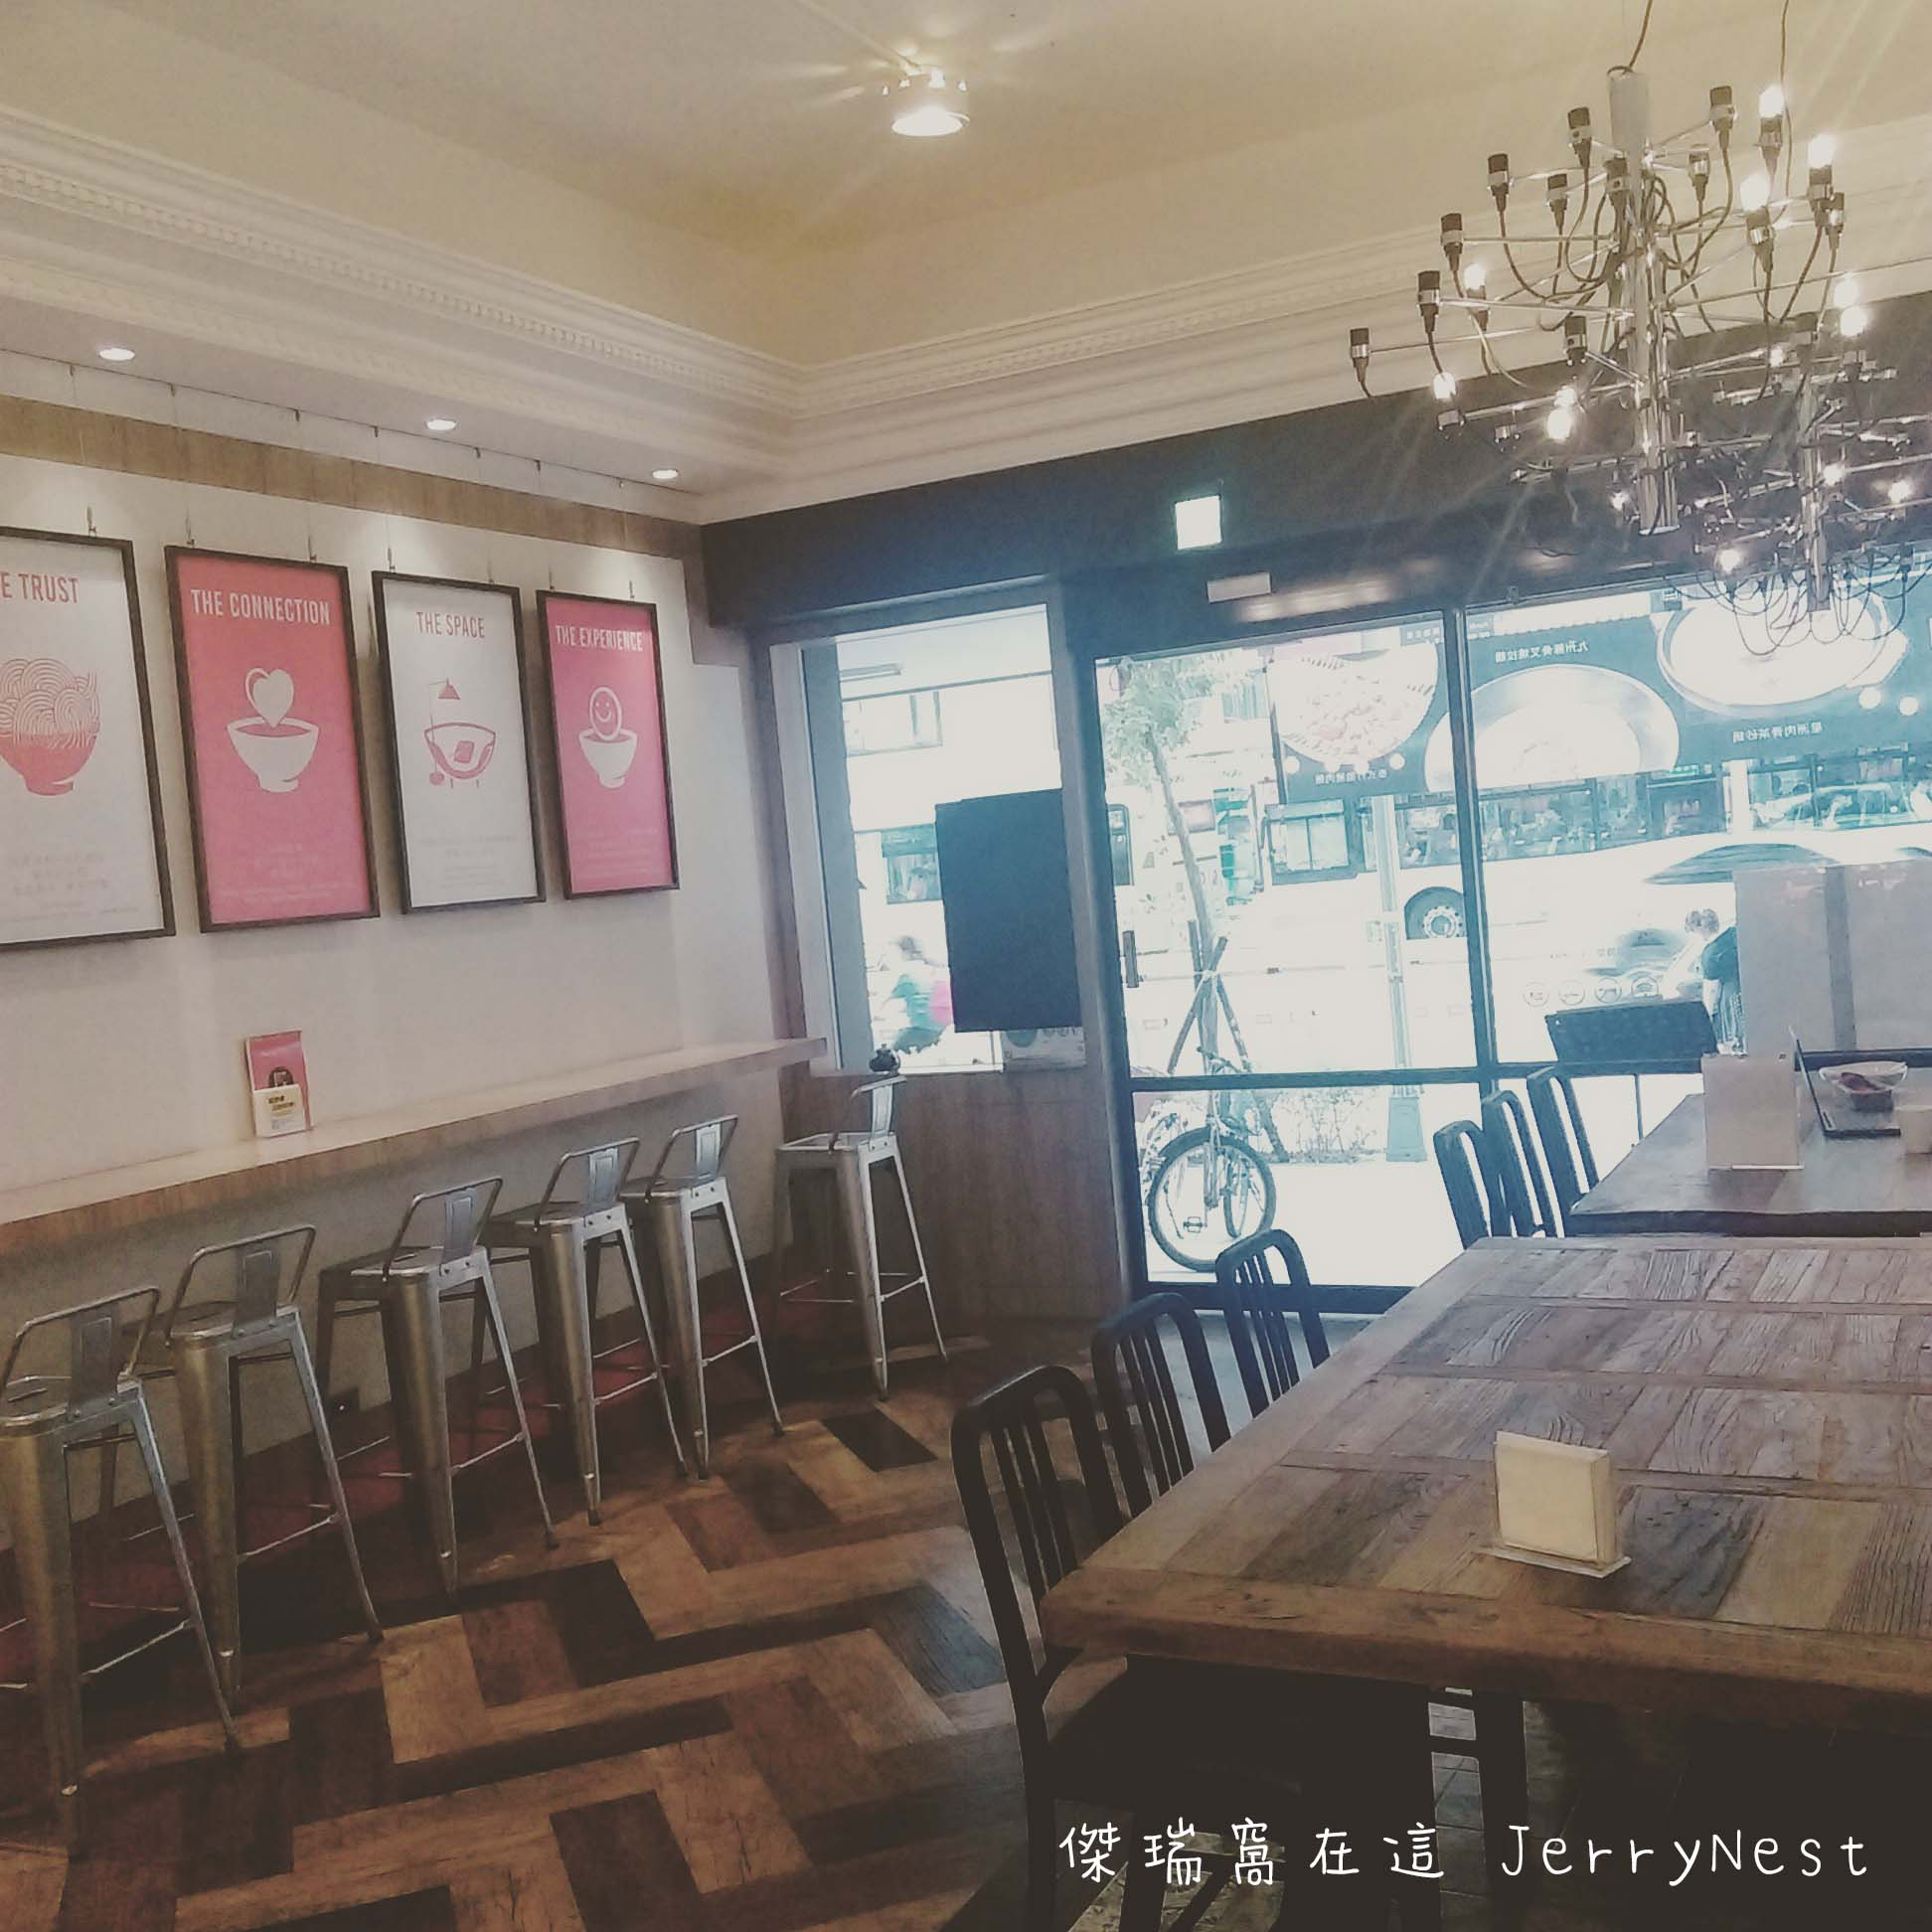 bb6 - 台北微風廣場|用碗喝飲料的亞洲特色餐廳 碗宴 Bowl Room